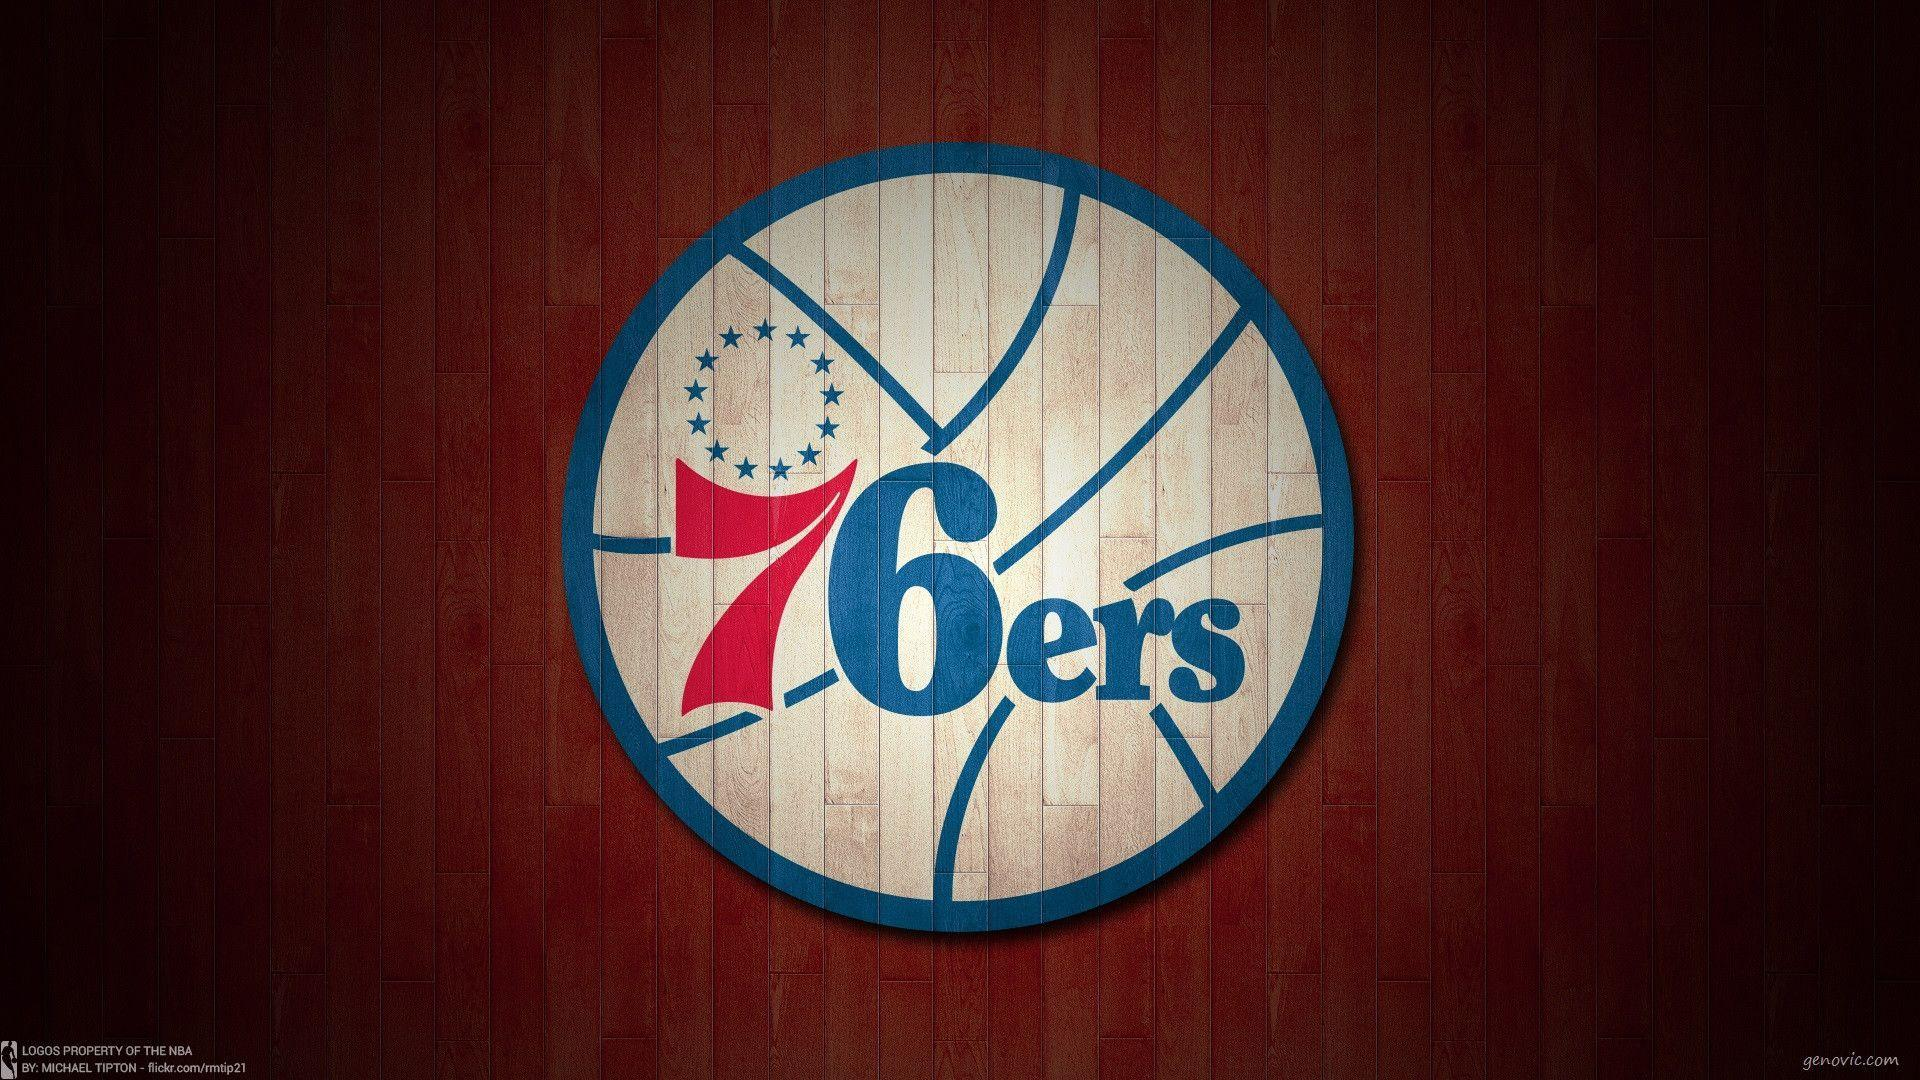 76ers - photo #3